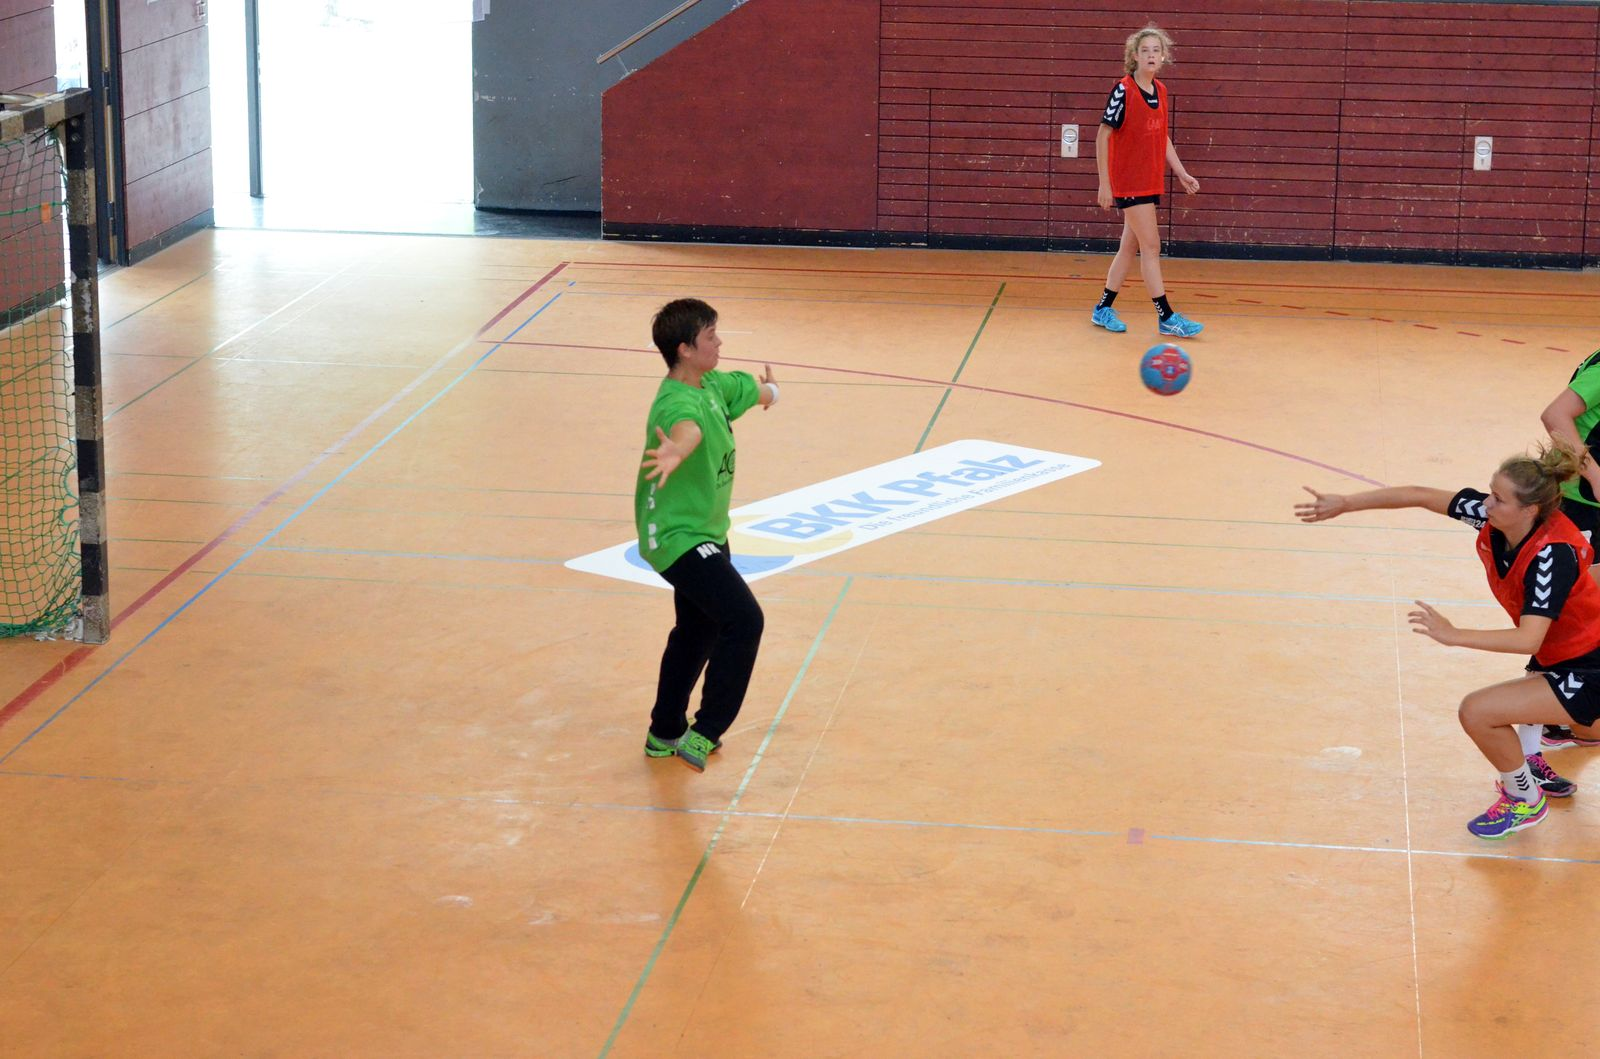 20160903_Metropolregion Handballcup Vorqualifikation_DSC_2061.JPG